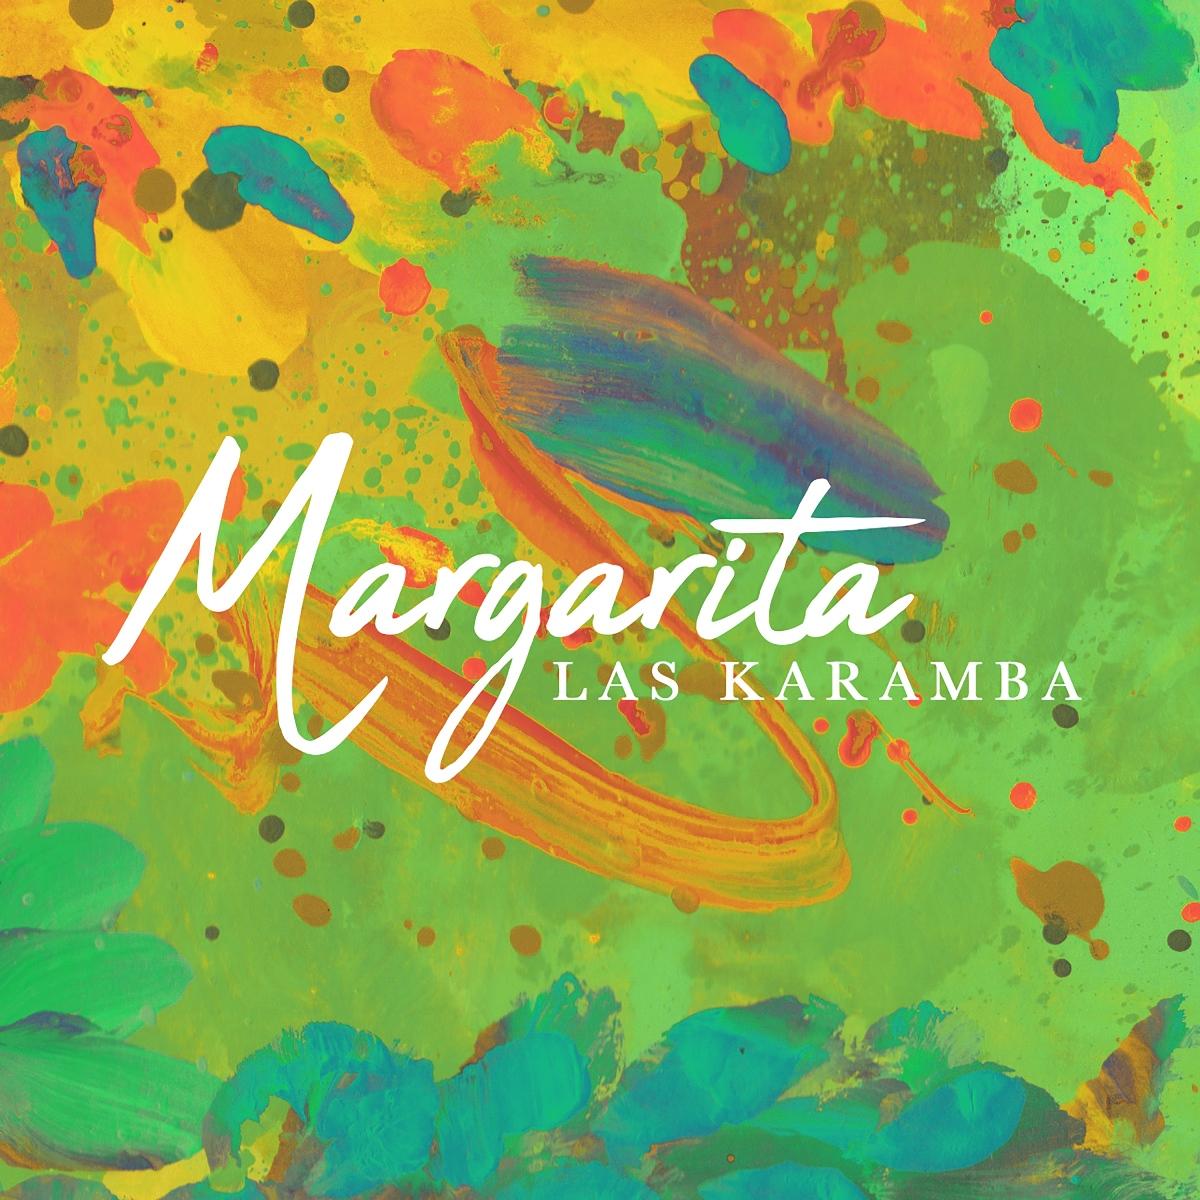 Portada Las Karamba - Margarita